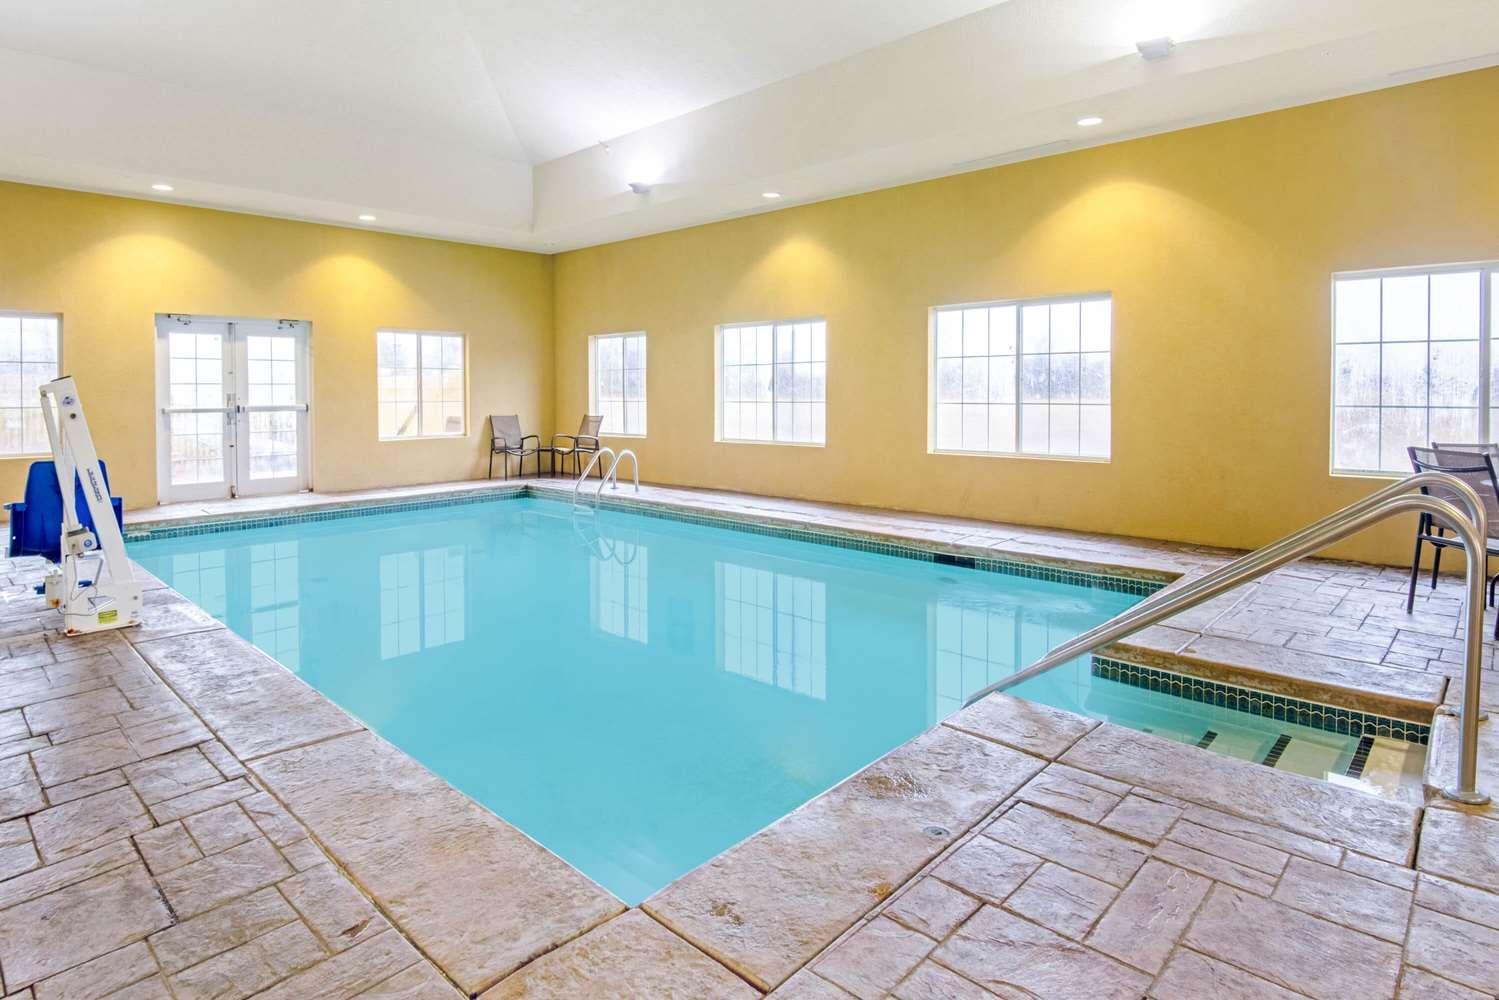 La Quinta Inn & Suites Lawton, OK - See